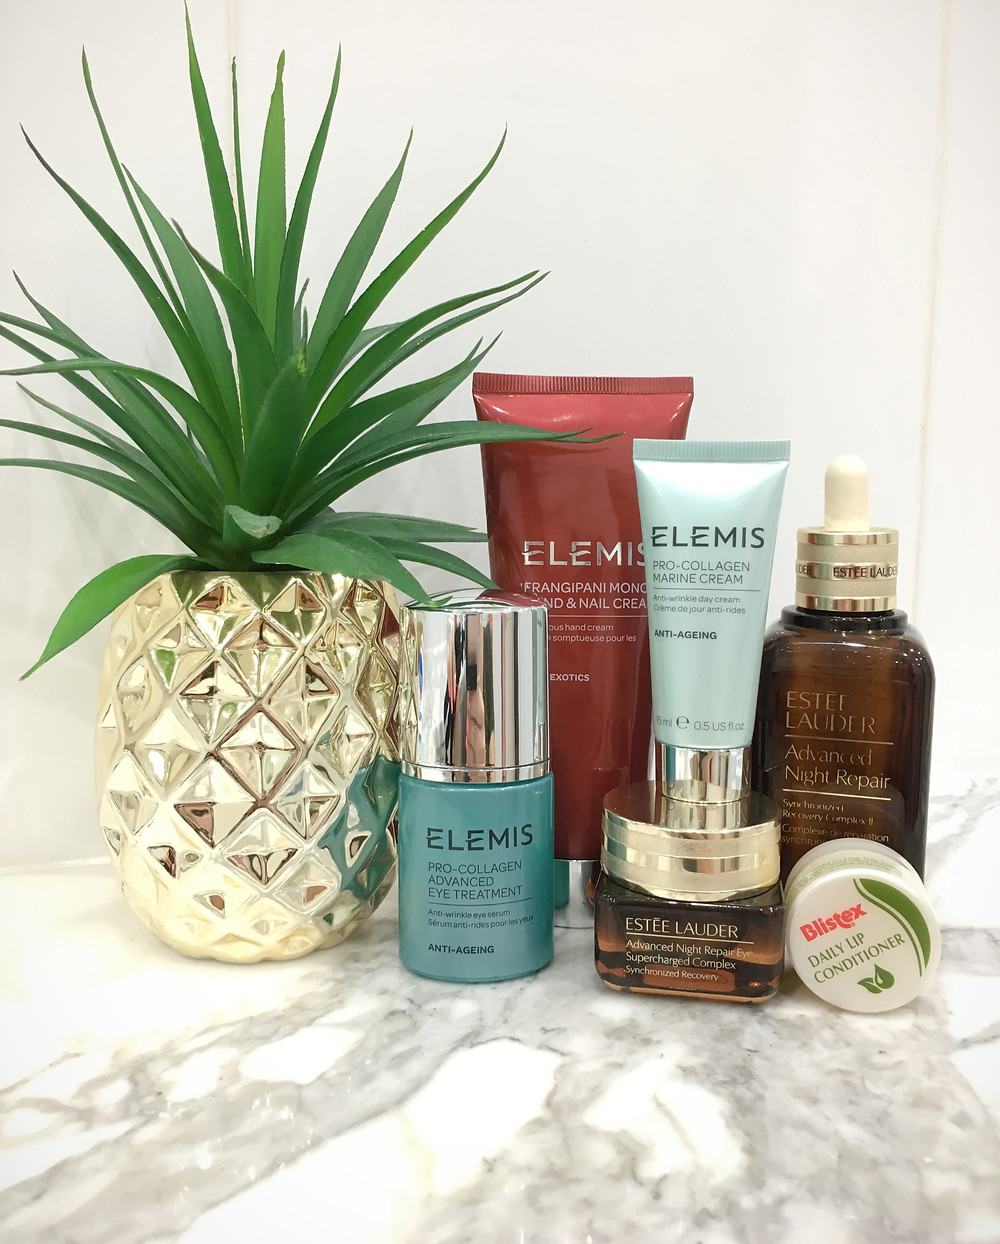 Essential in flight beauty skin care items. Elemis pro-collagen eye treatment, pro-collagen day cream, estee laurder advanced night repair serum